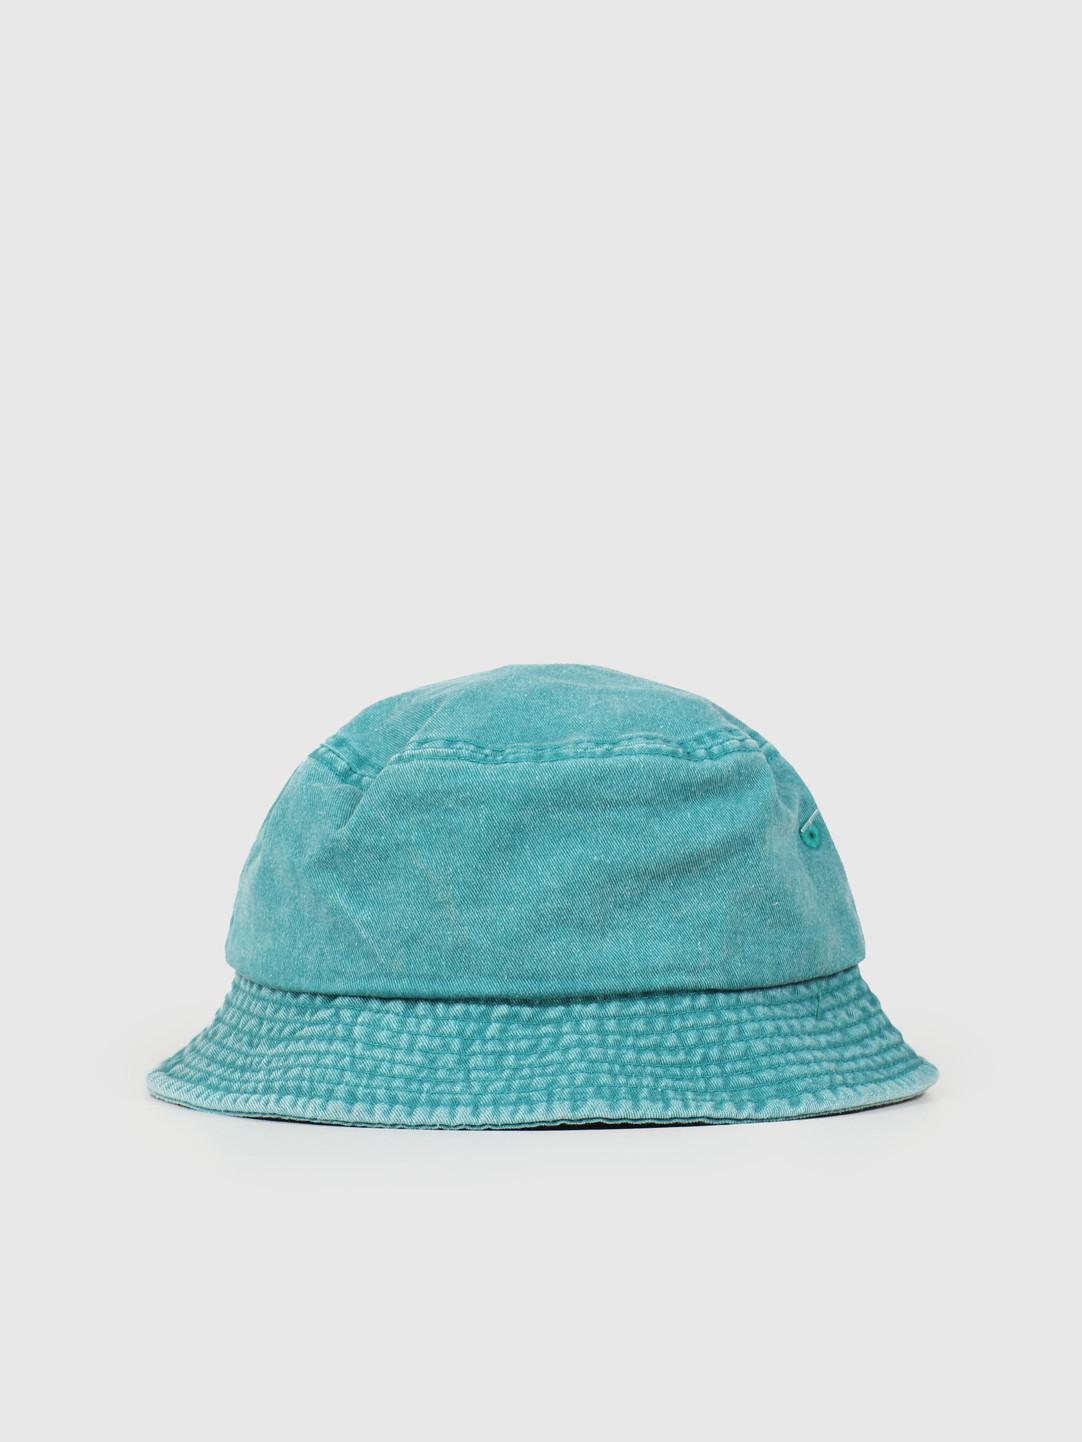 Stussy Stussy Stock Washed Bucket Hat Green 132980